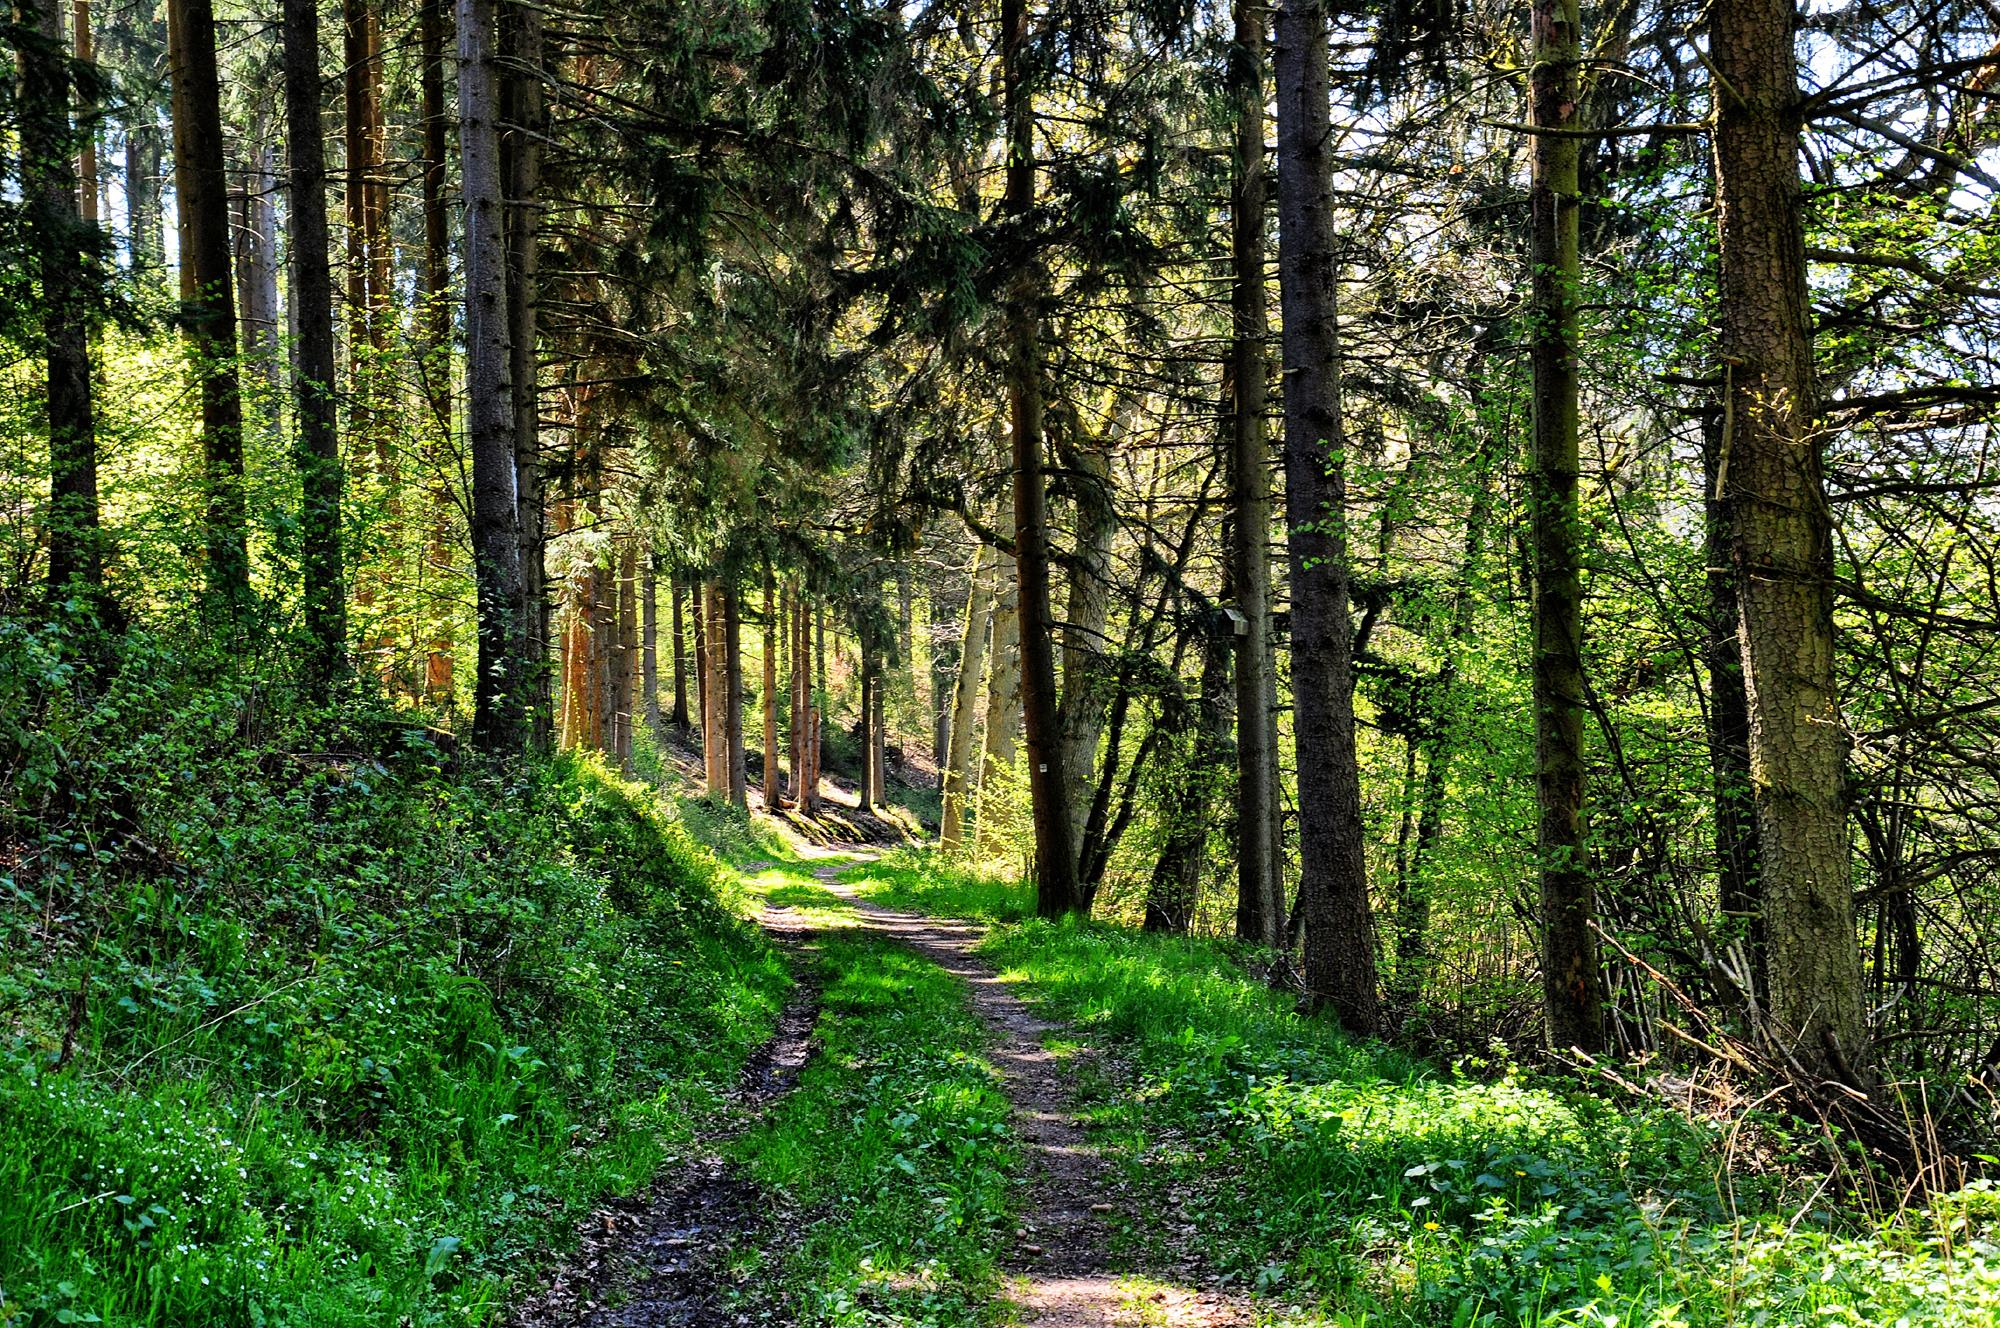 Tal des Diefenbach